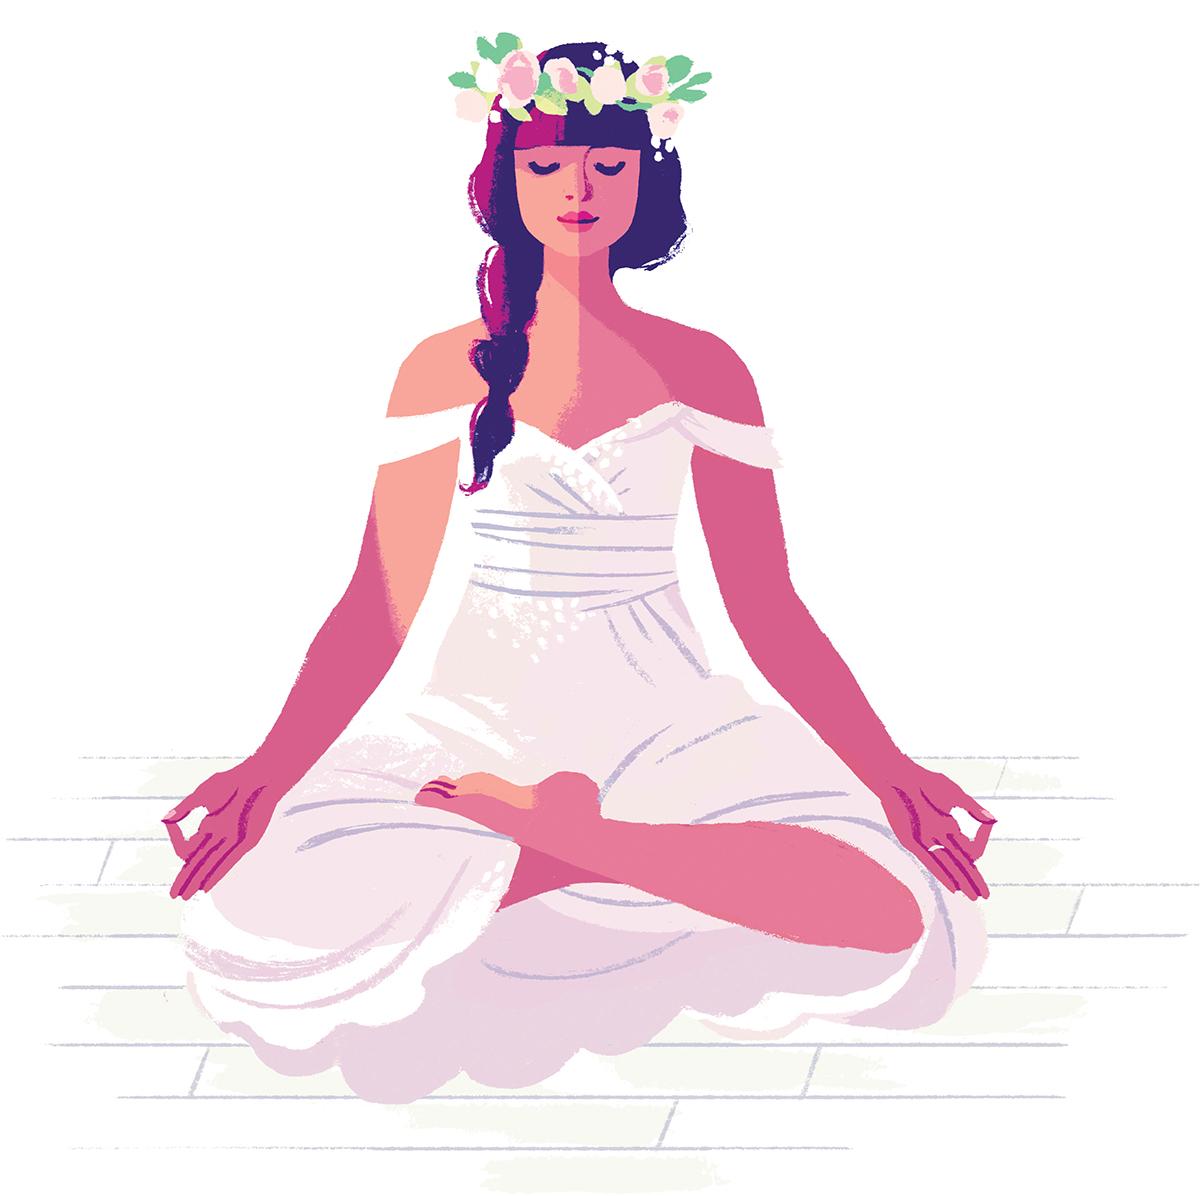 Color zen magazine - Illustration By Kali Ciesemier